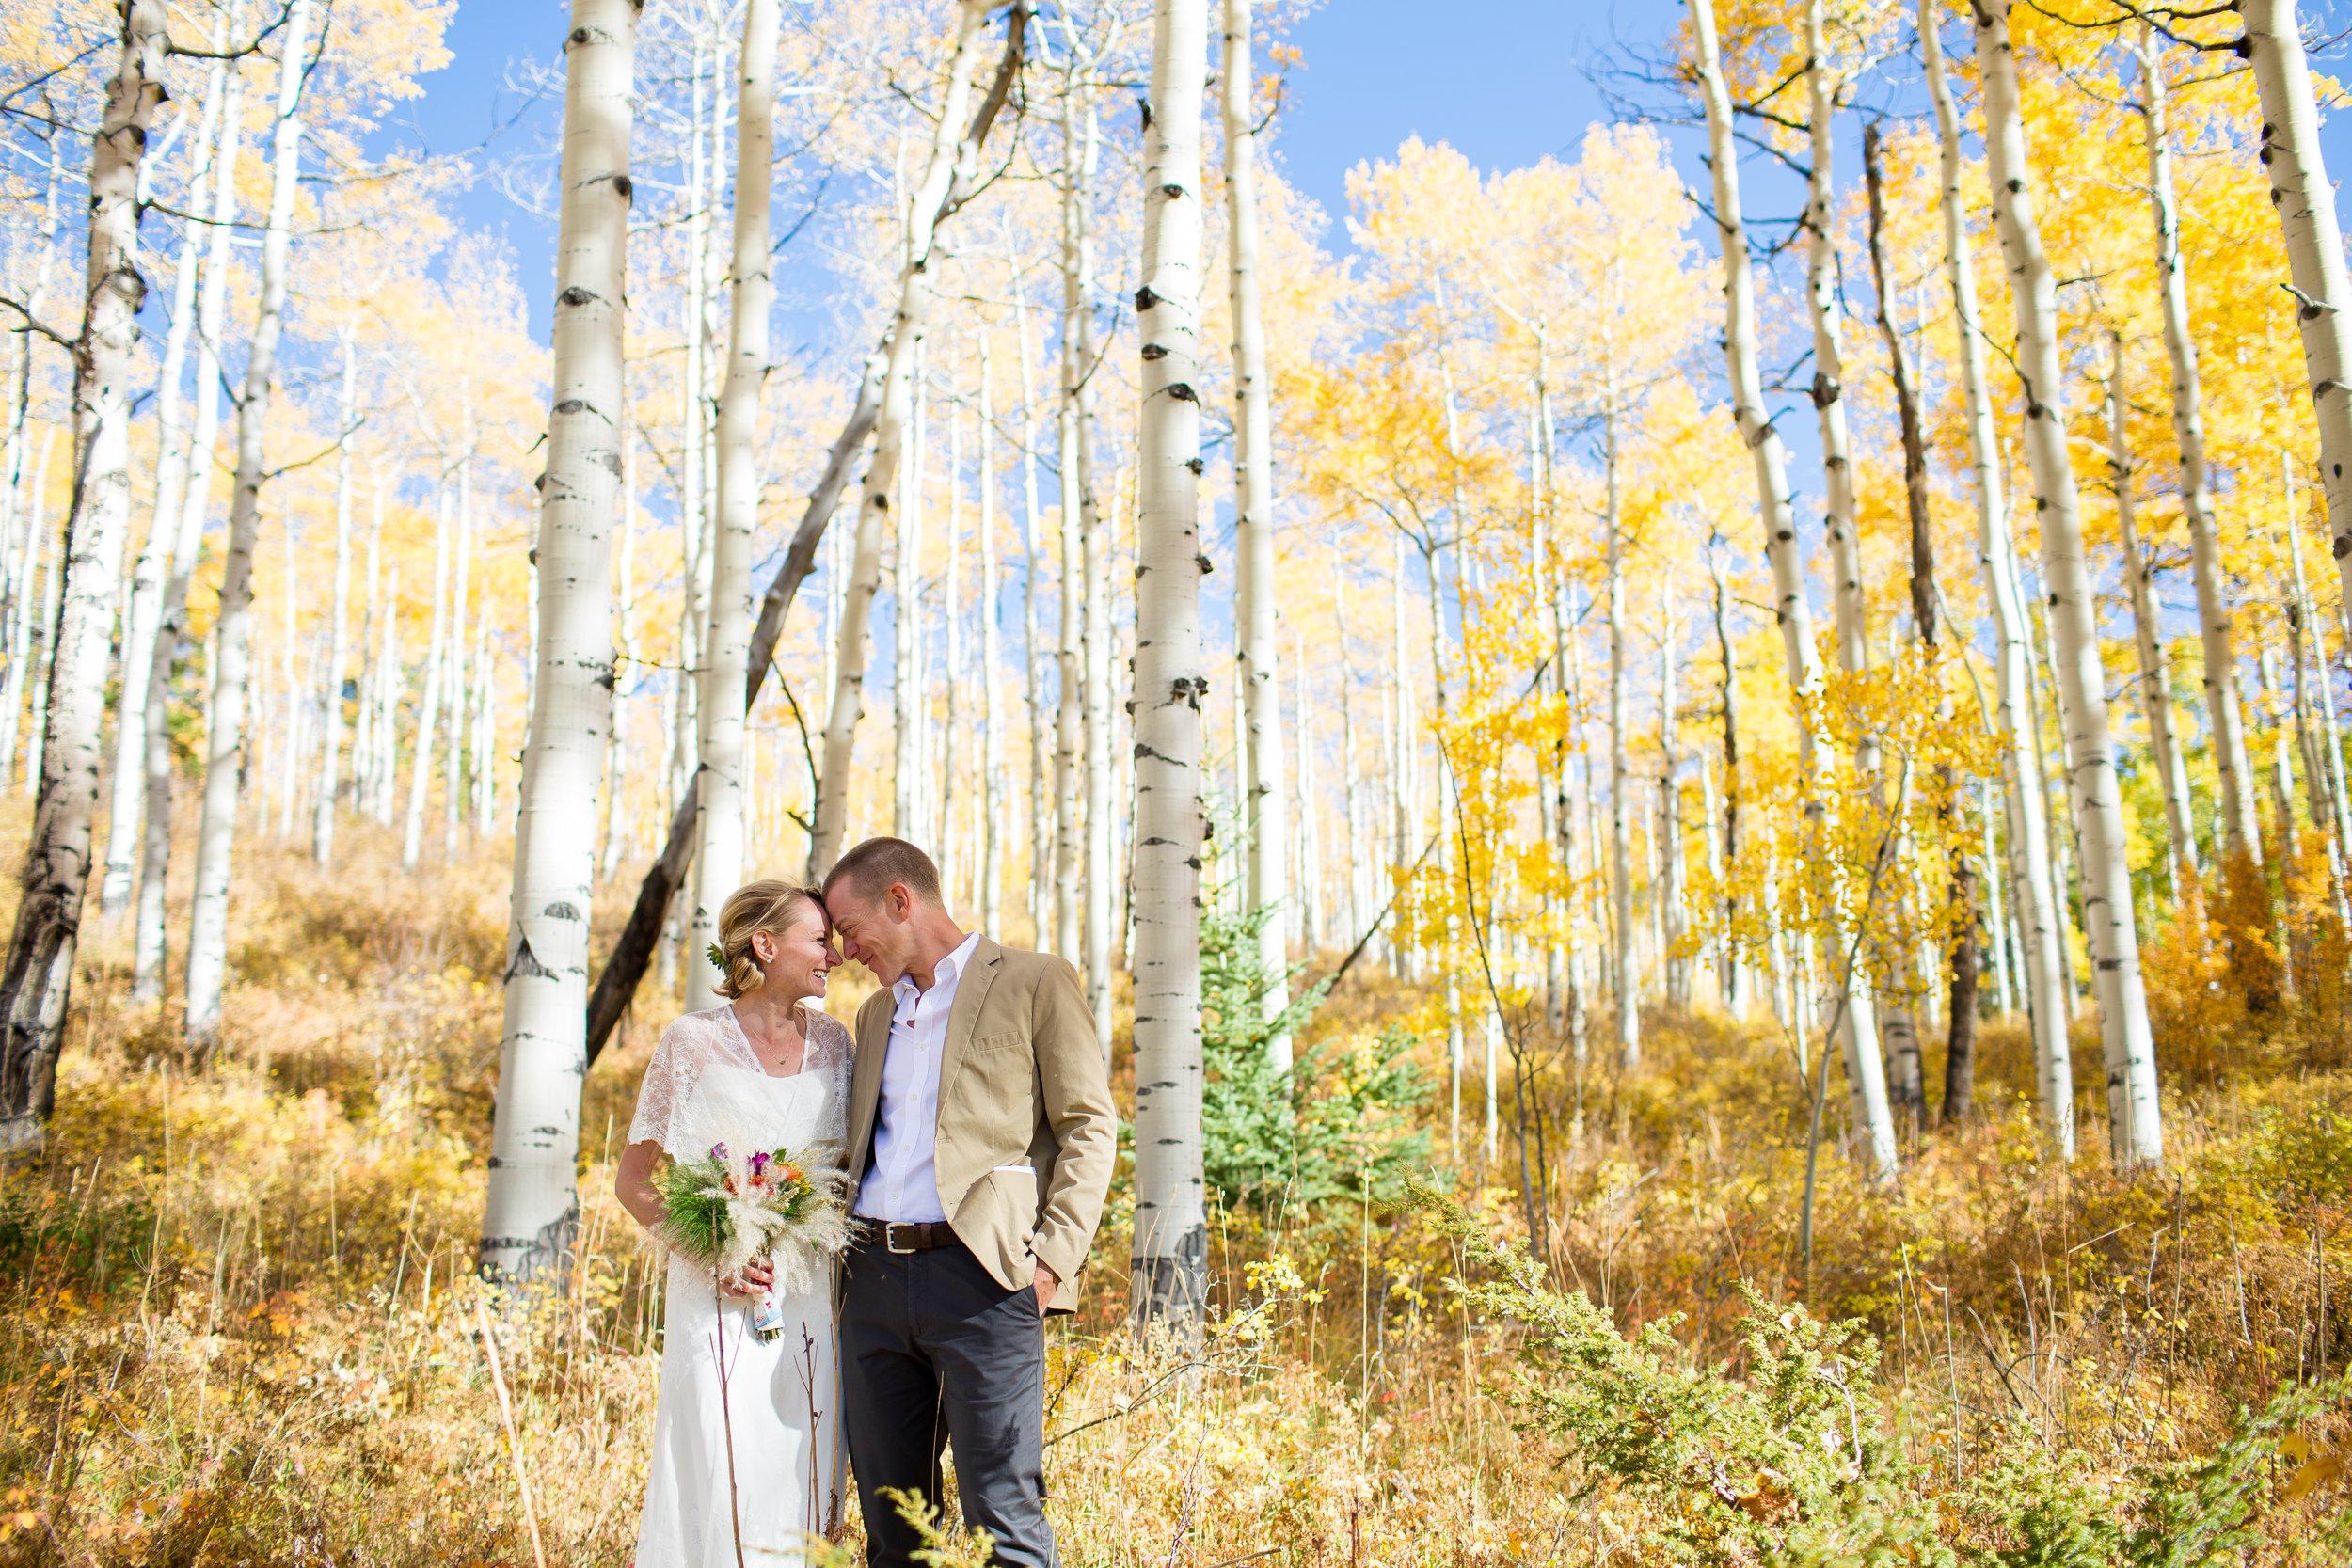 2016.09.25_Jarchow_Wedding_FINAL-2457.jpg